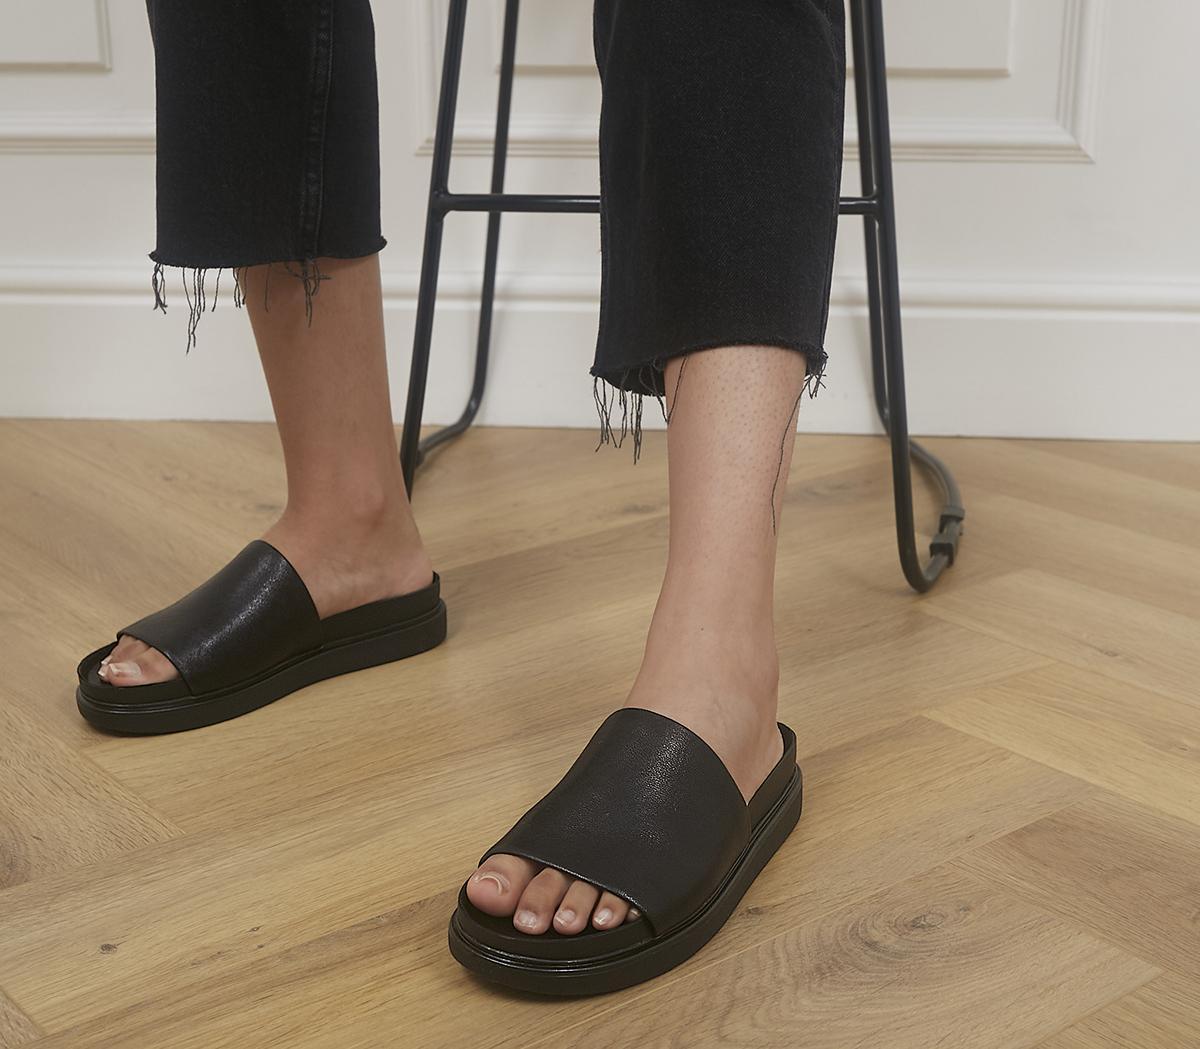 Vagabond Erin Sandals Black - Sandals